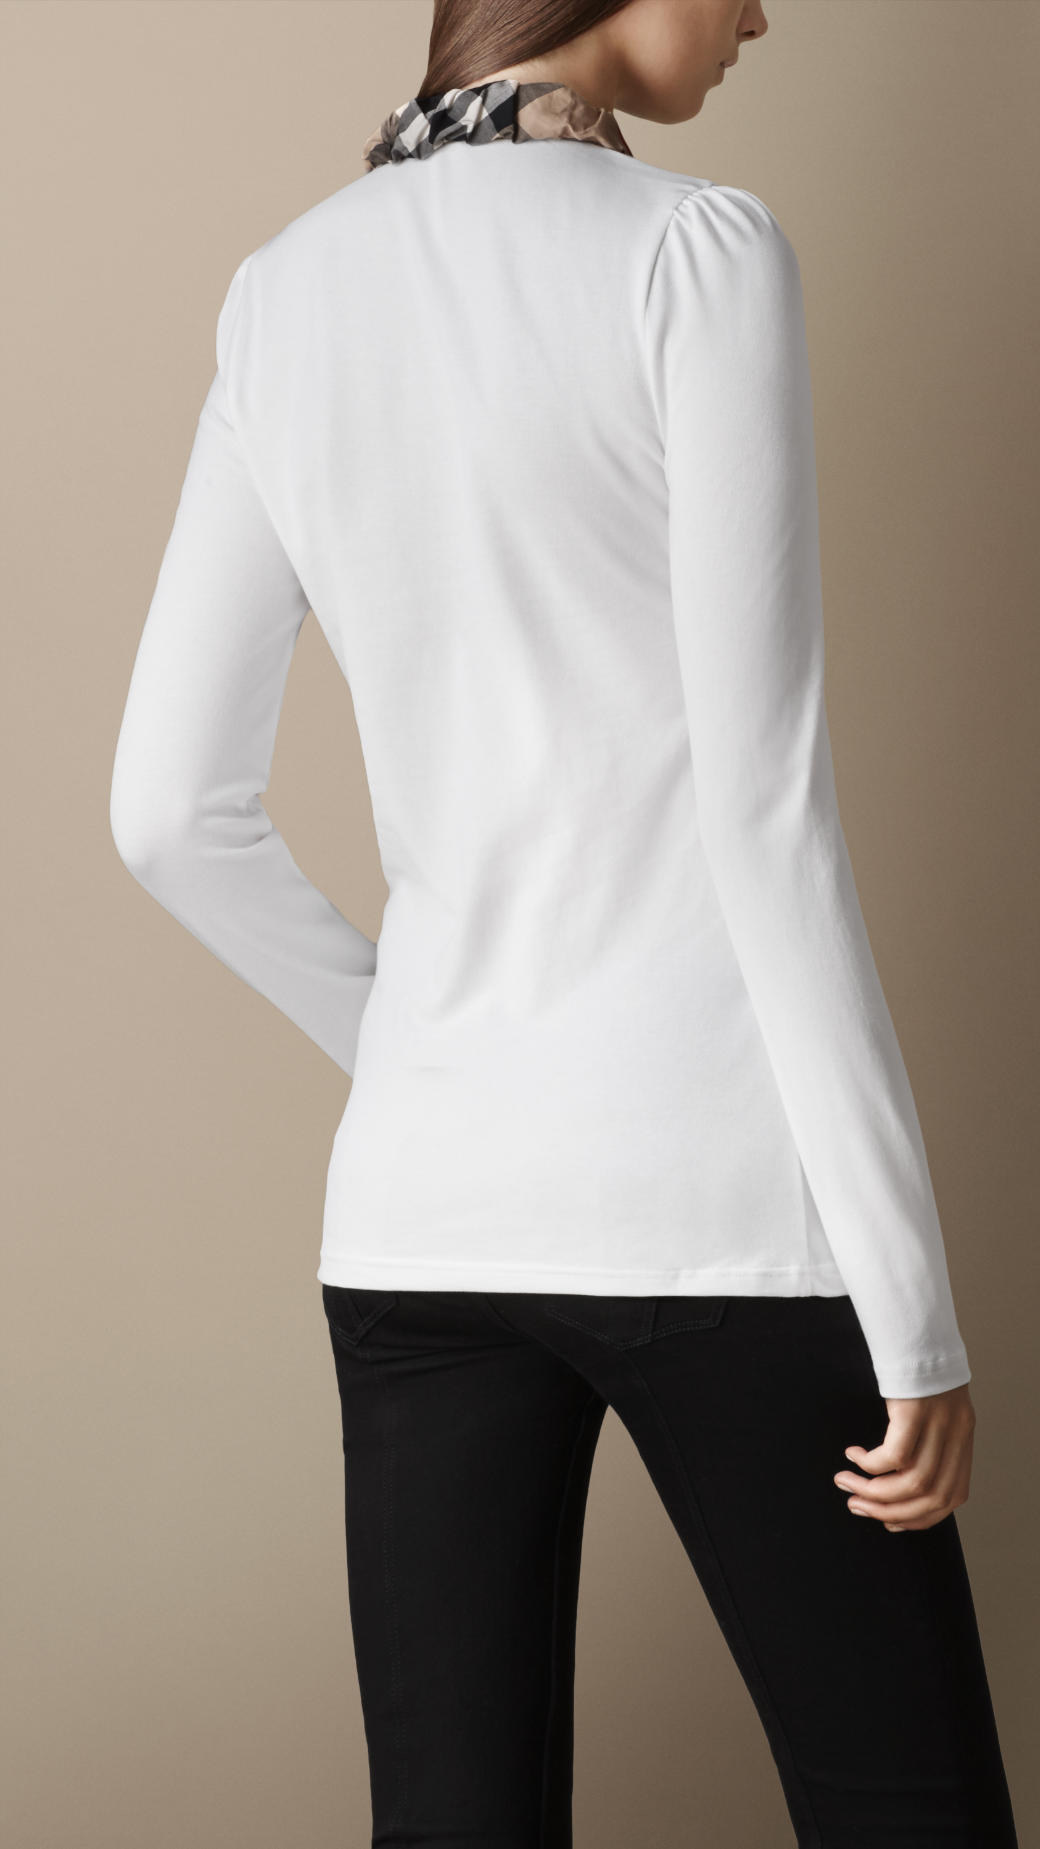 a2bda6055d9c Lyst - Burberry Long Sleeve Check Collar Polo Shirt in White